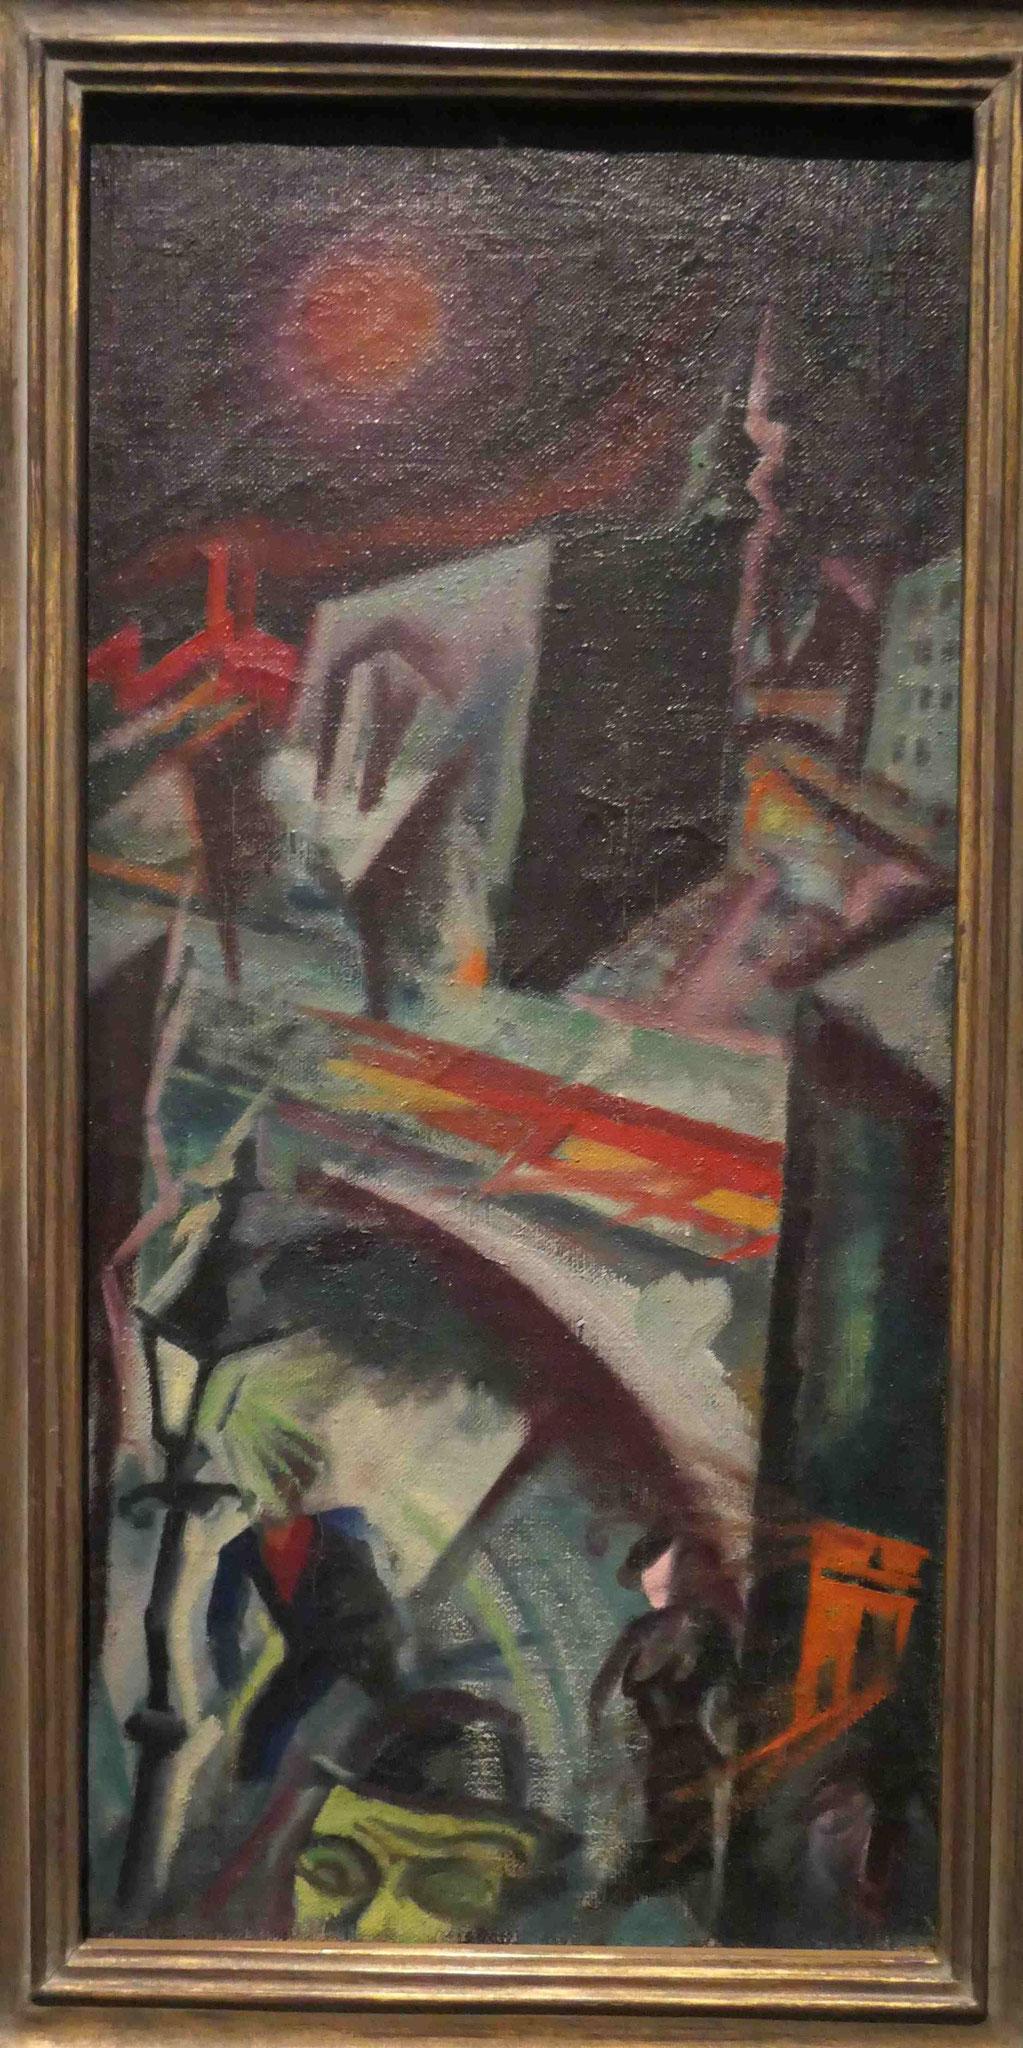 George Grosz, Nachtstück (Berlin-Südende), 1915, Neue Nationalgalerie Berlin